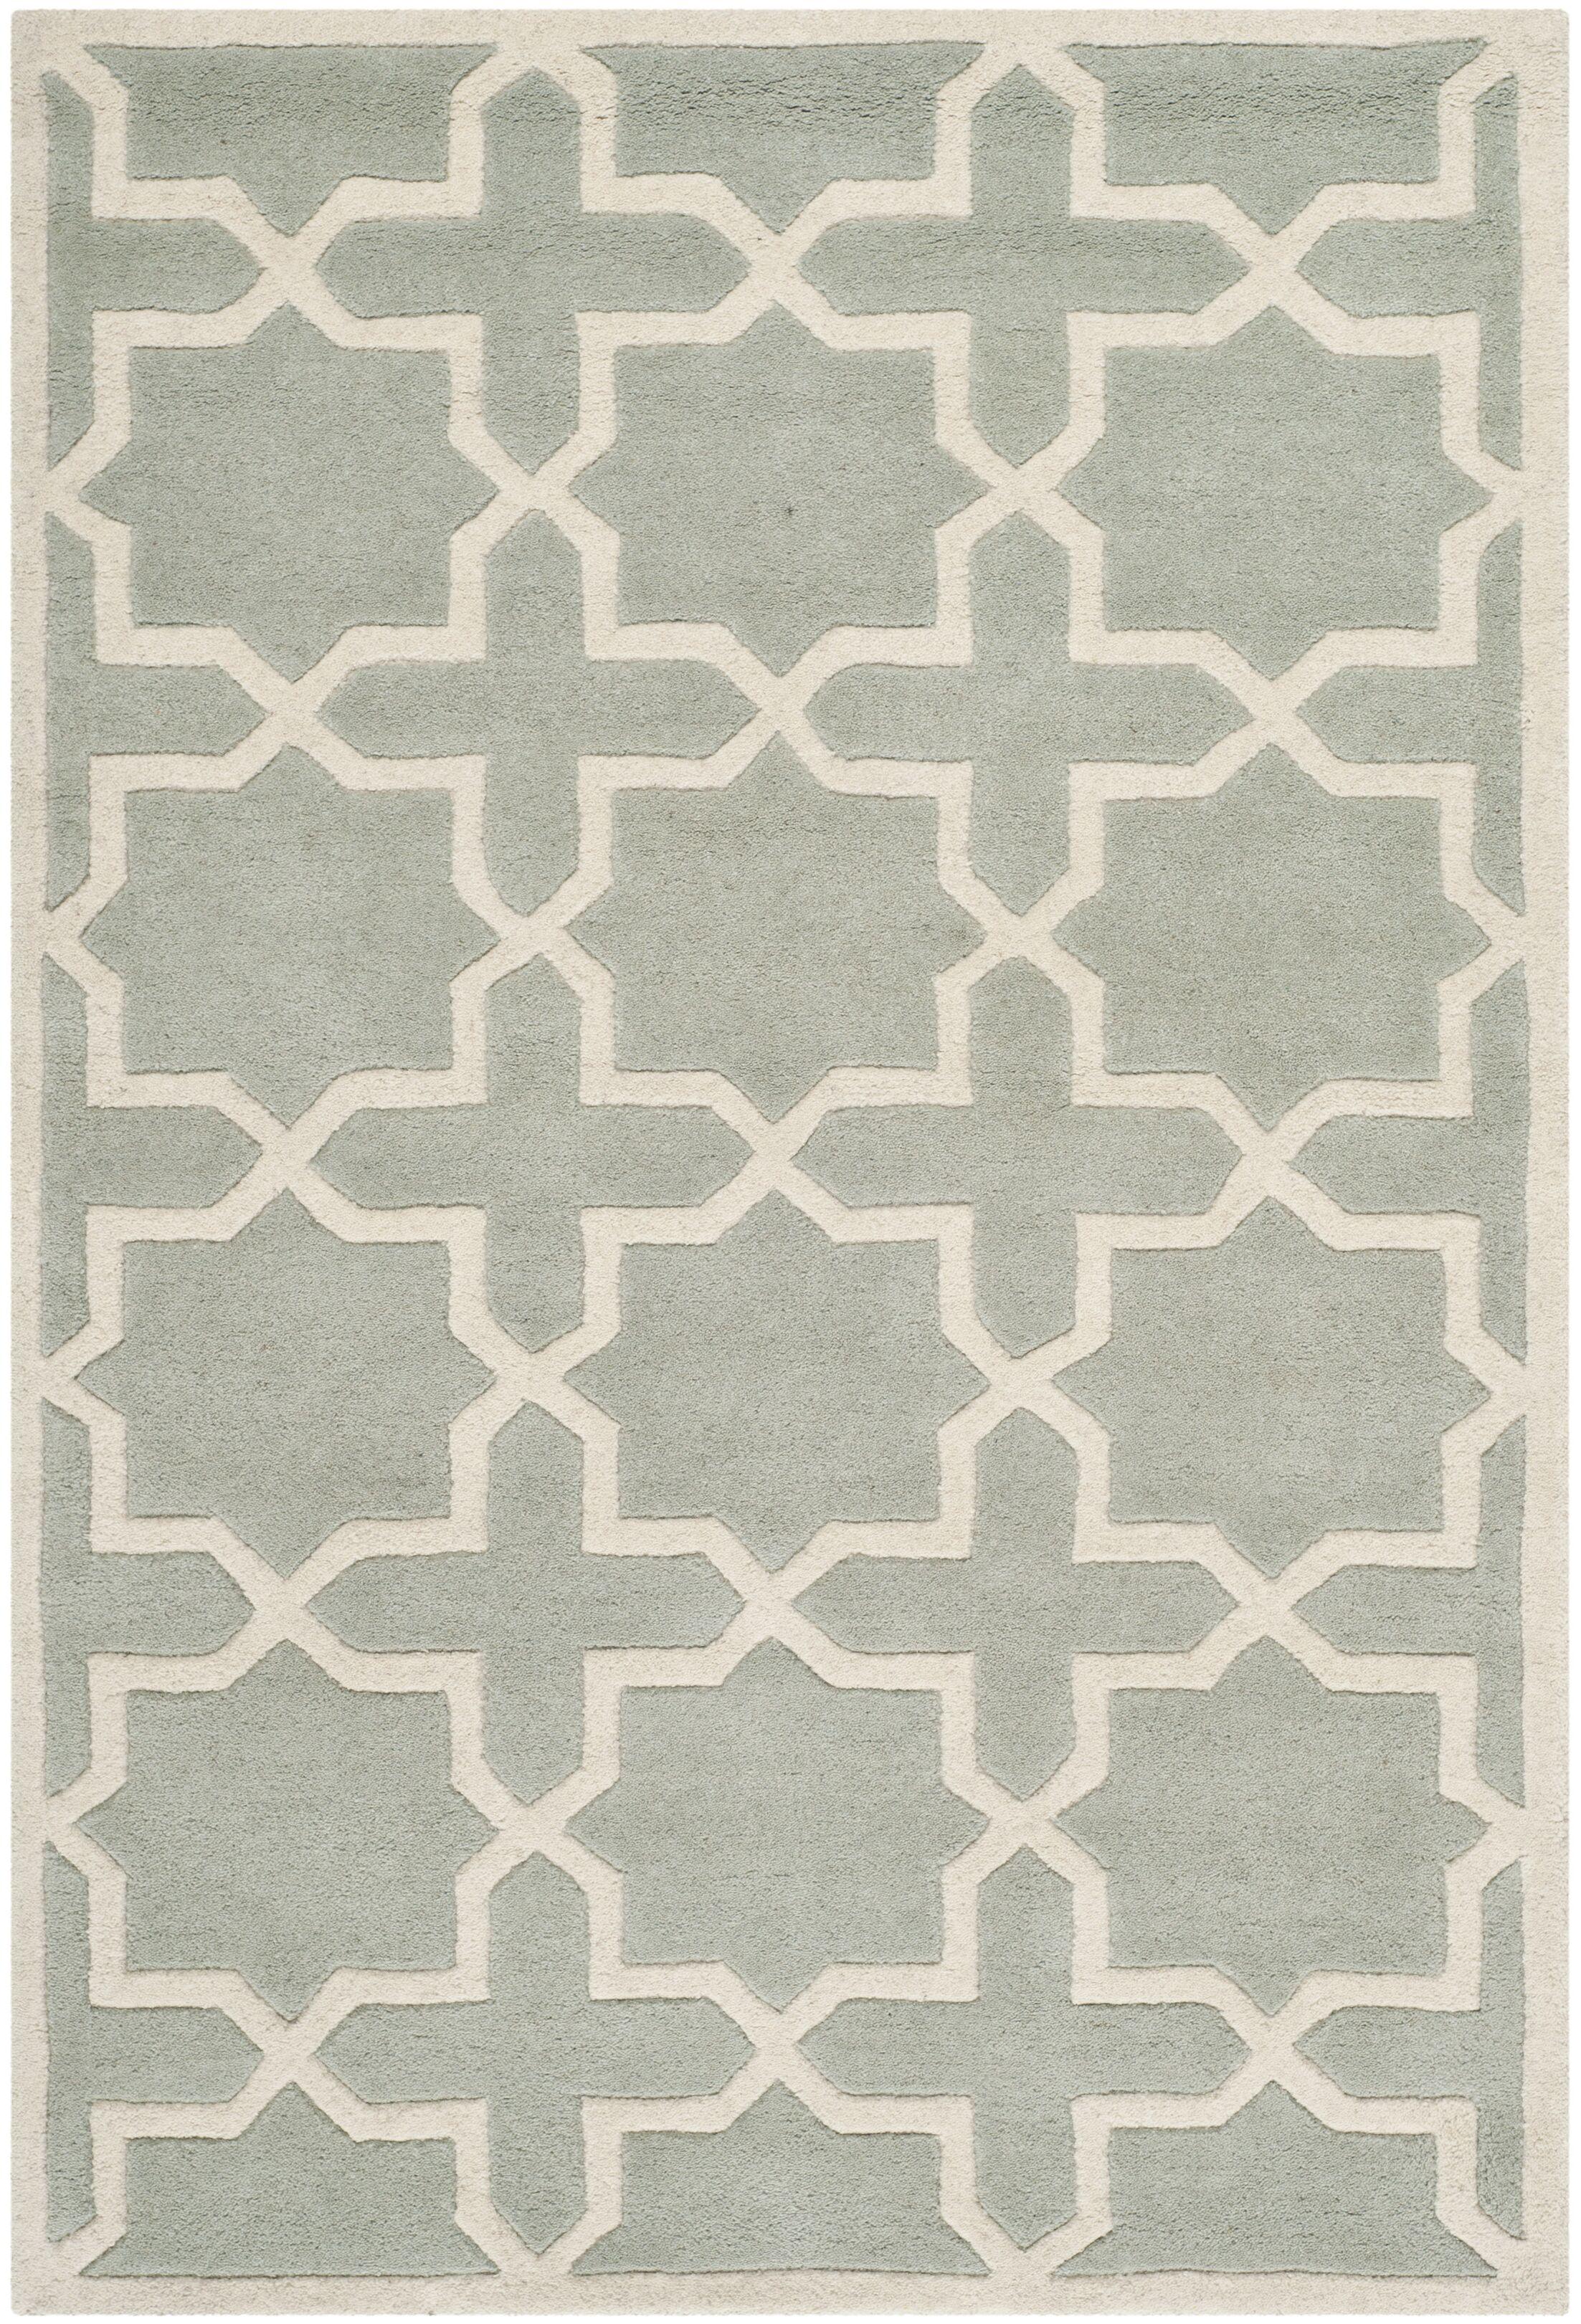 Wilkin Hand-Woven Gray Area Rug Rug Size: Rectangle 3' x 5'